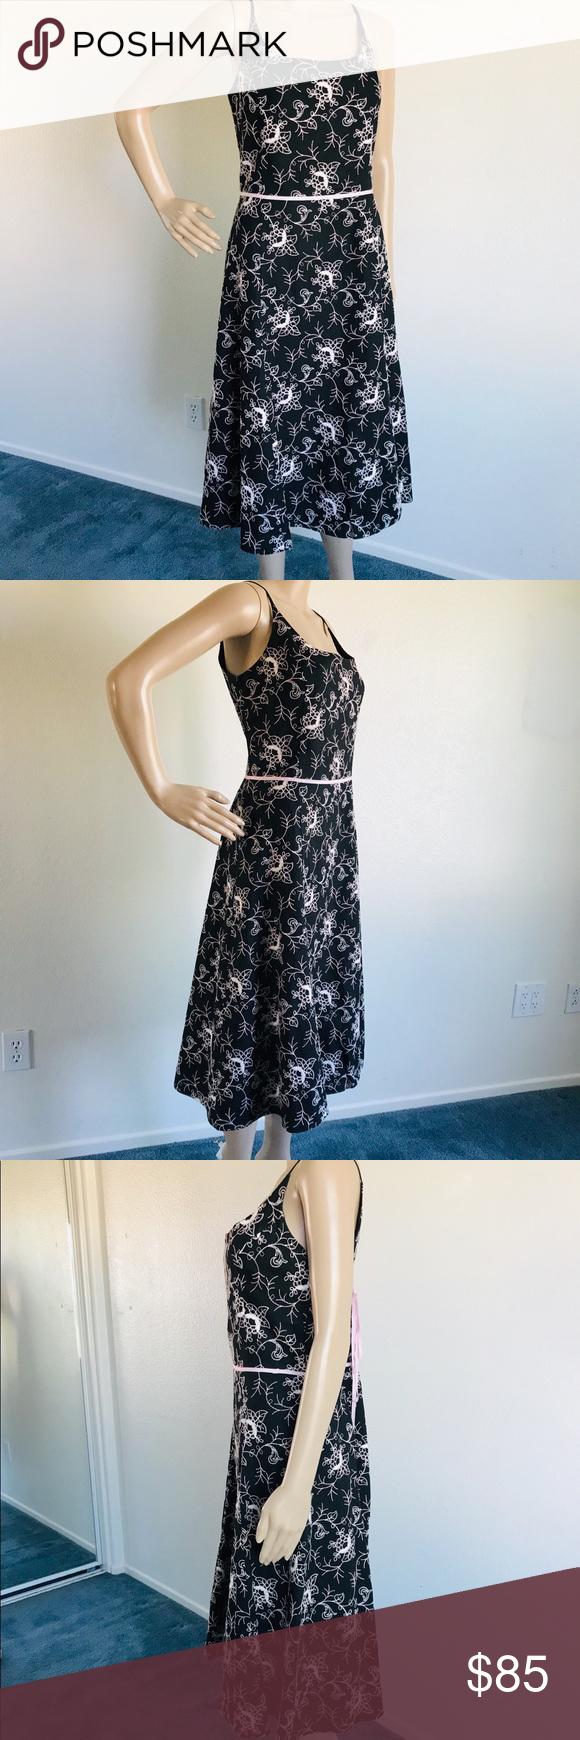 Anthropologie Beth Bowley Summer Dress Size 12 Summer Dresses Dresses Clothes Design [ 1740 x 580 Pixel ]